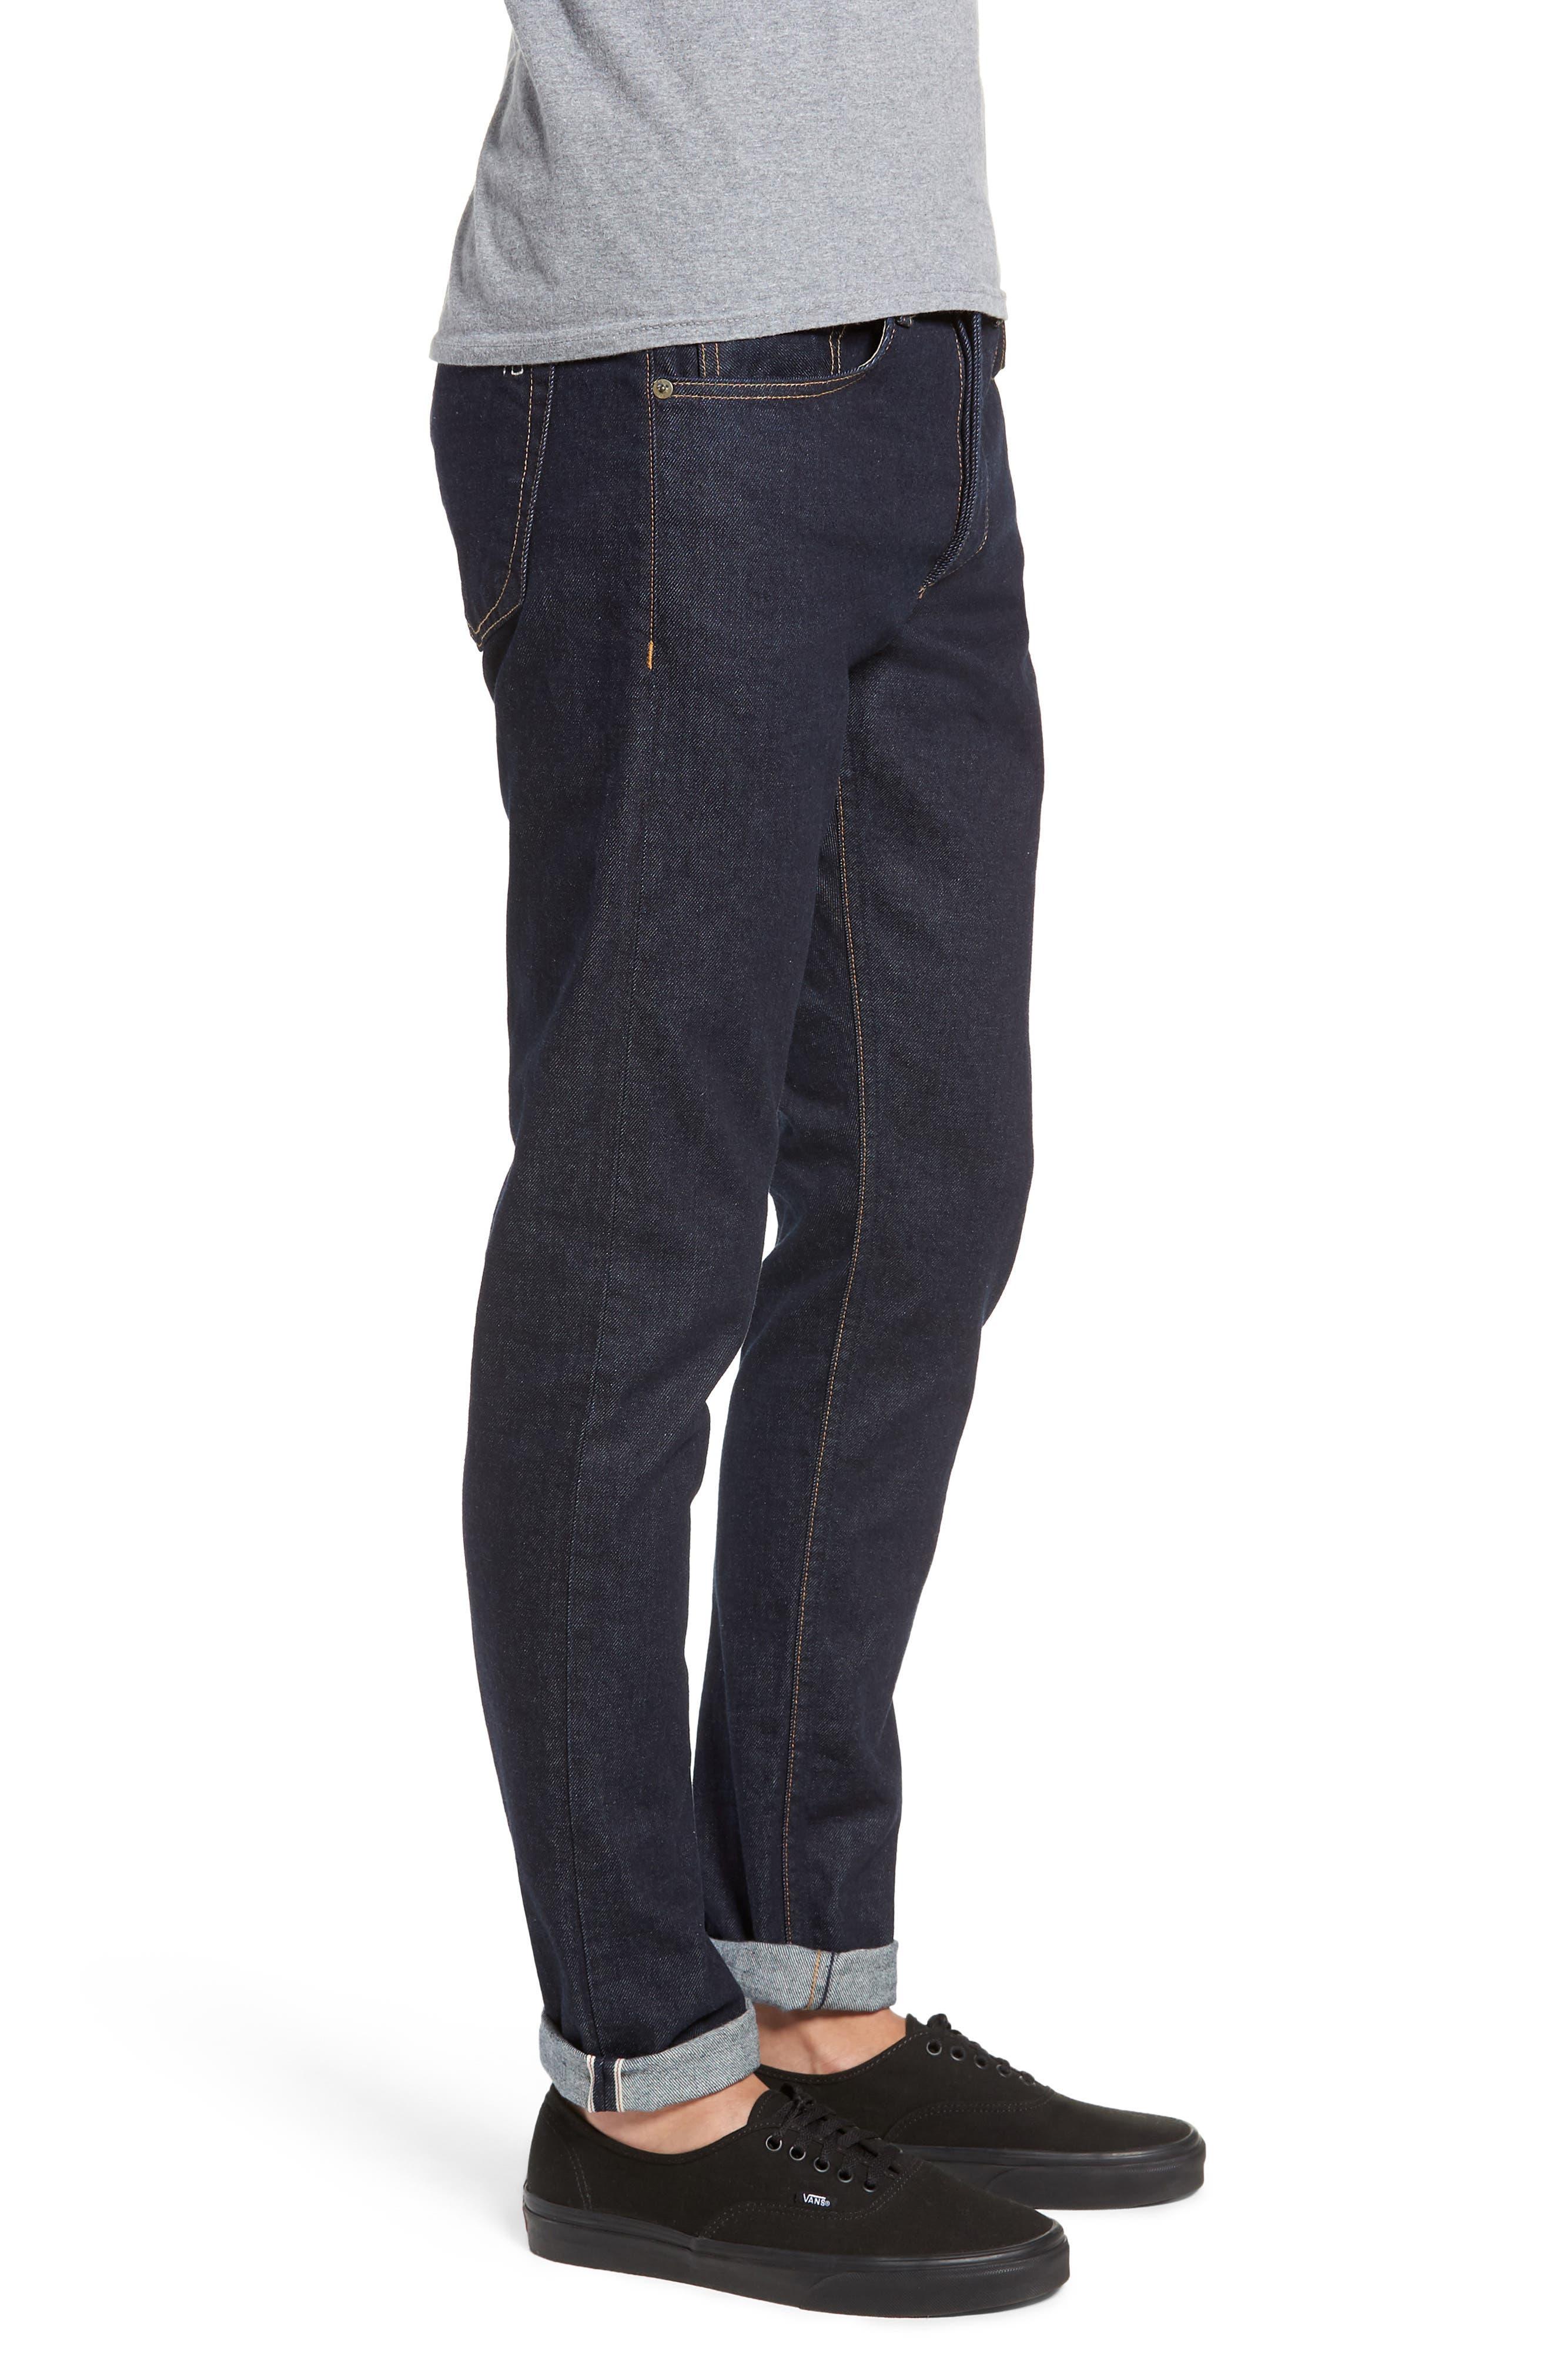 Fit 1 Skinny Fit Jeans,                             Alternate thumbnail 3, color,                             INDIGO RINSE SELVEDGE